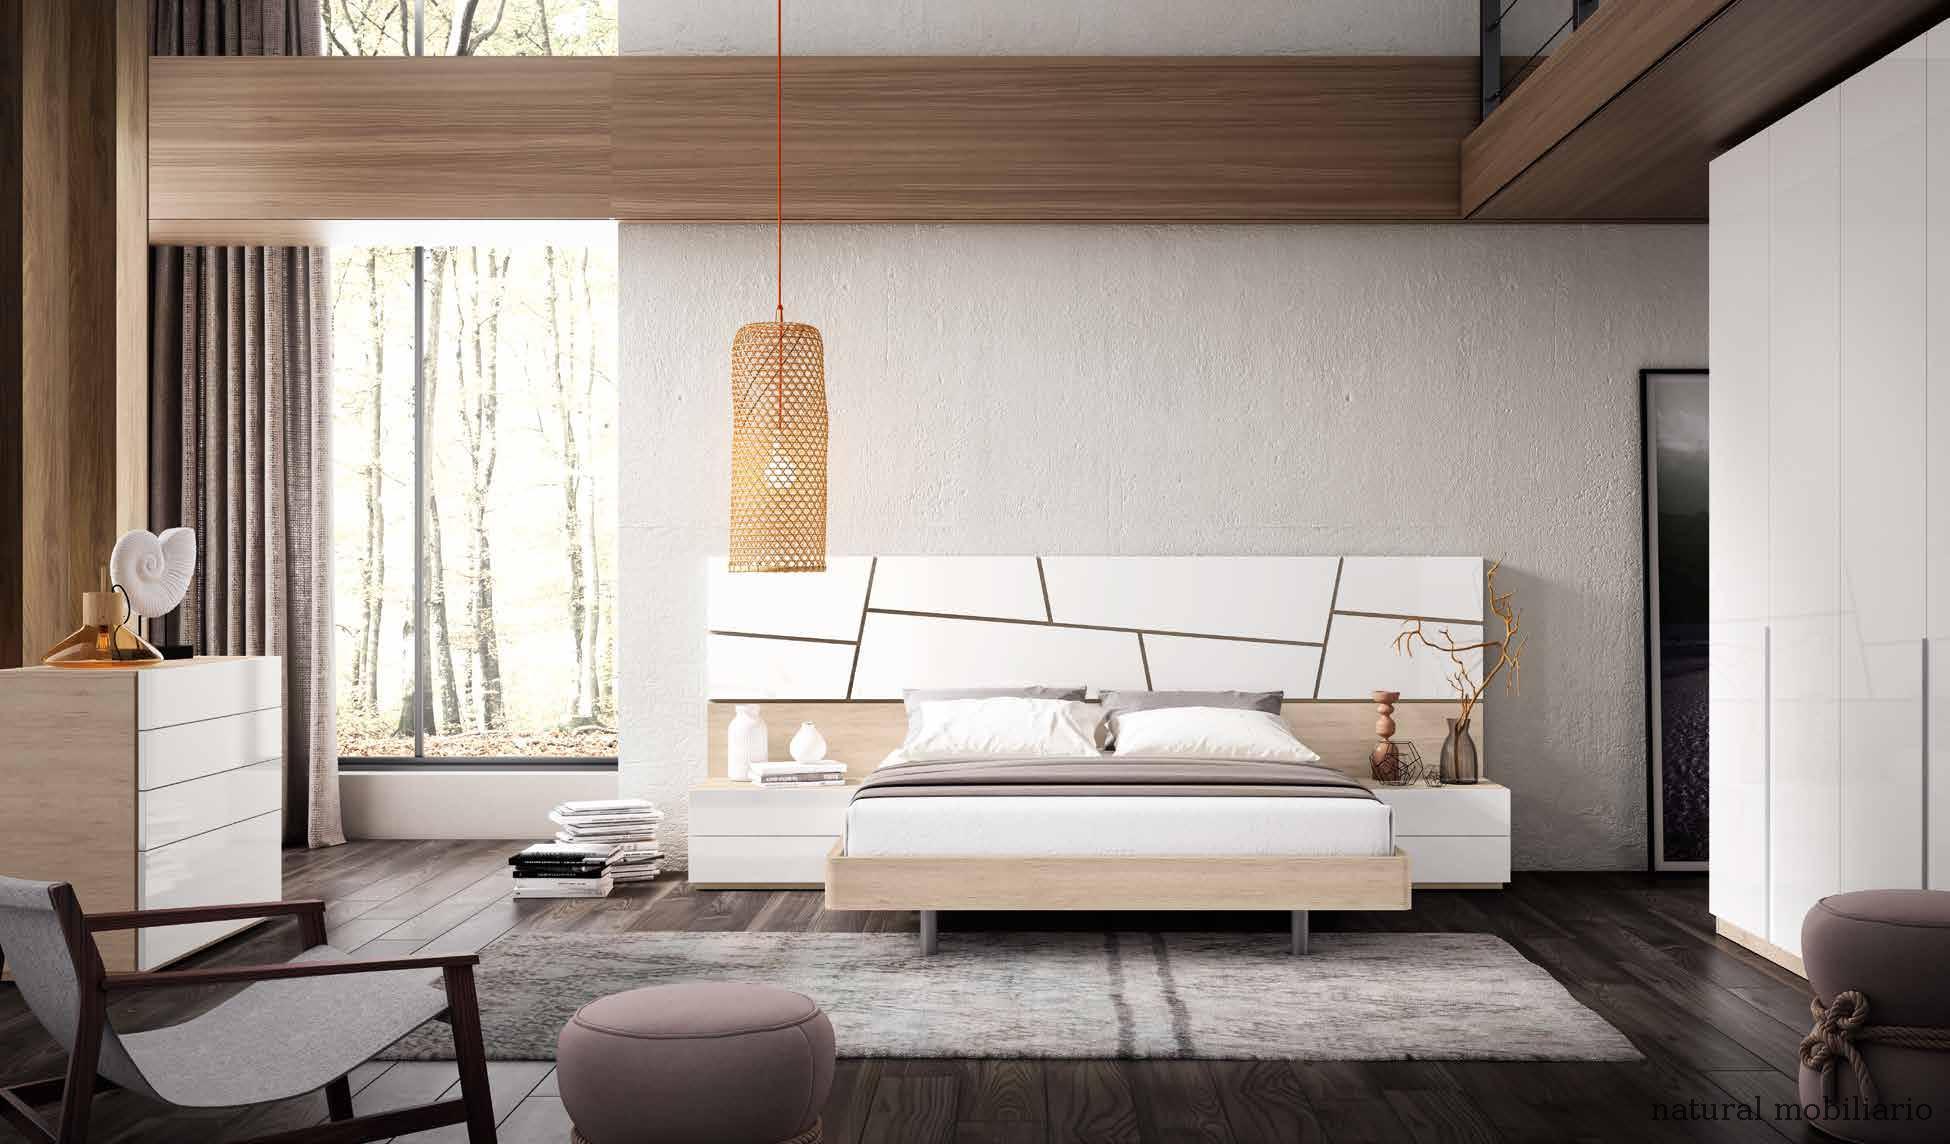 Muebles Modernos chapa sintética/lacados Dormitorio Boho Moderno